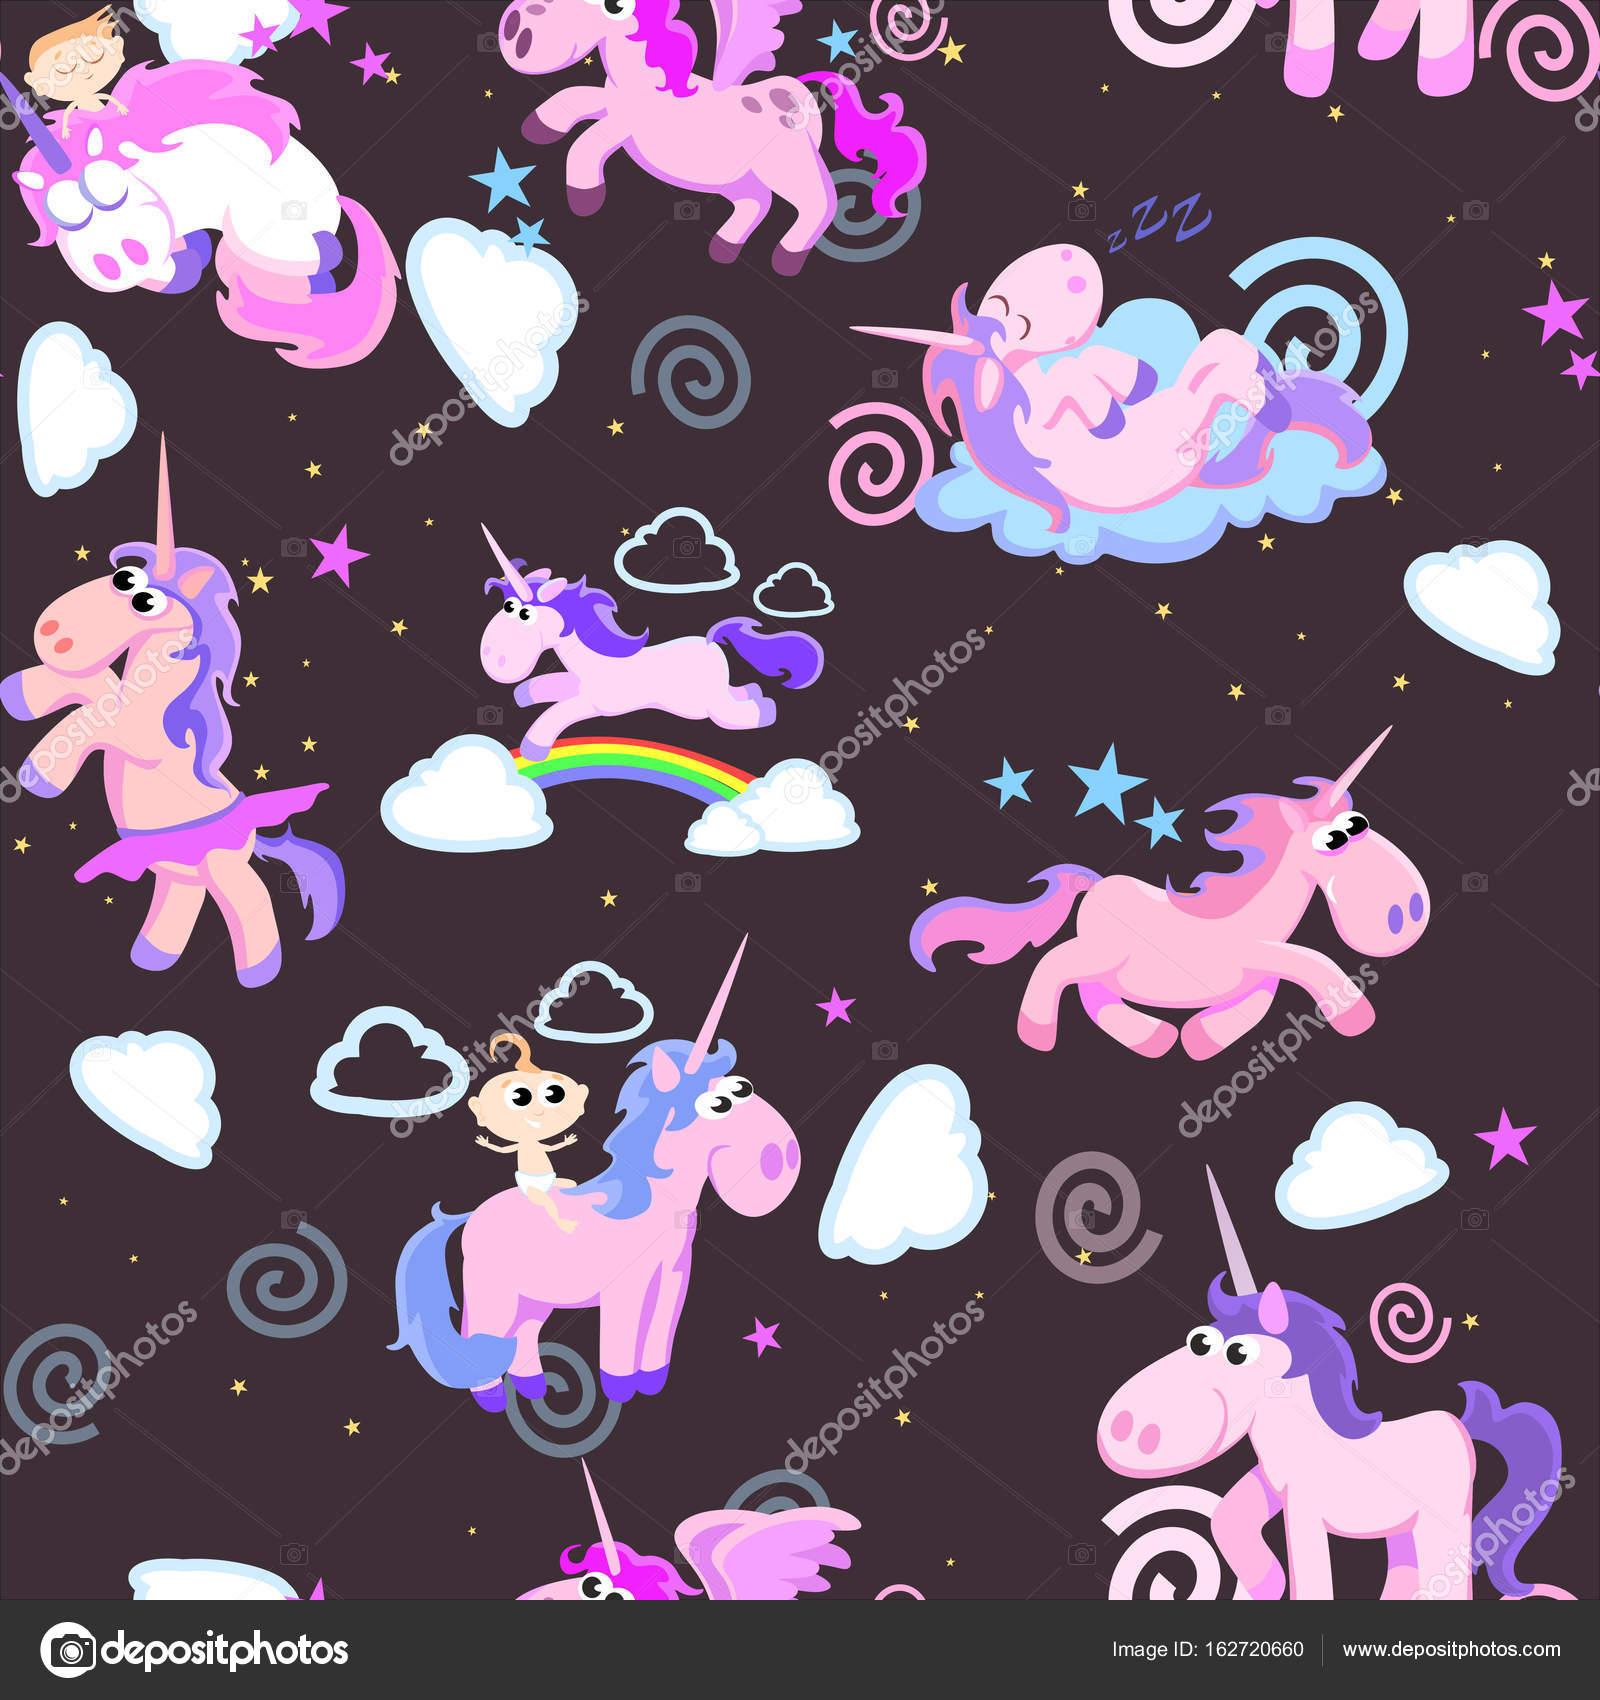 Cute Unicorn Seamless Pattern Magic Pegasus Flying With